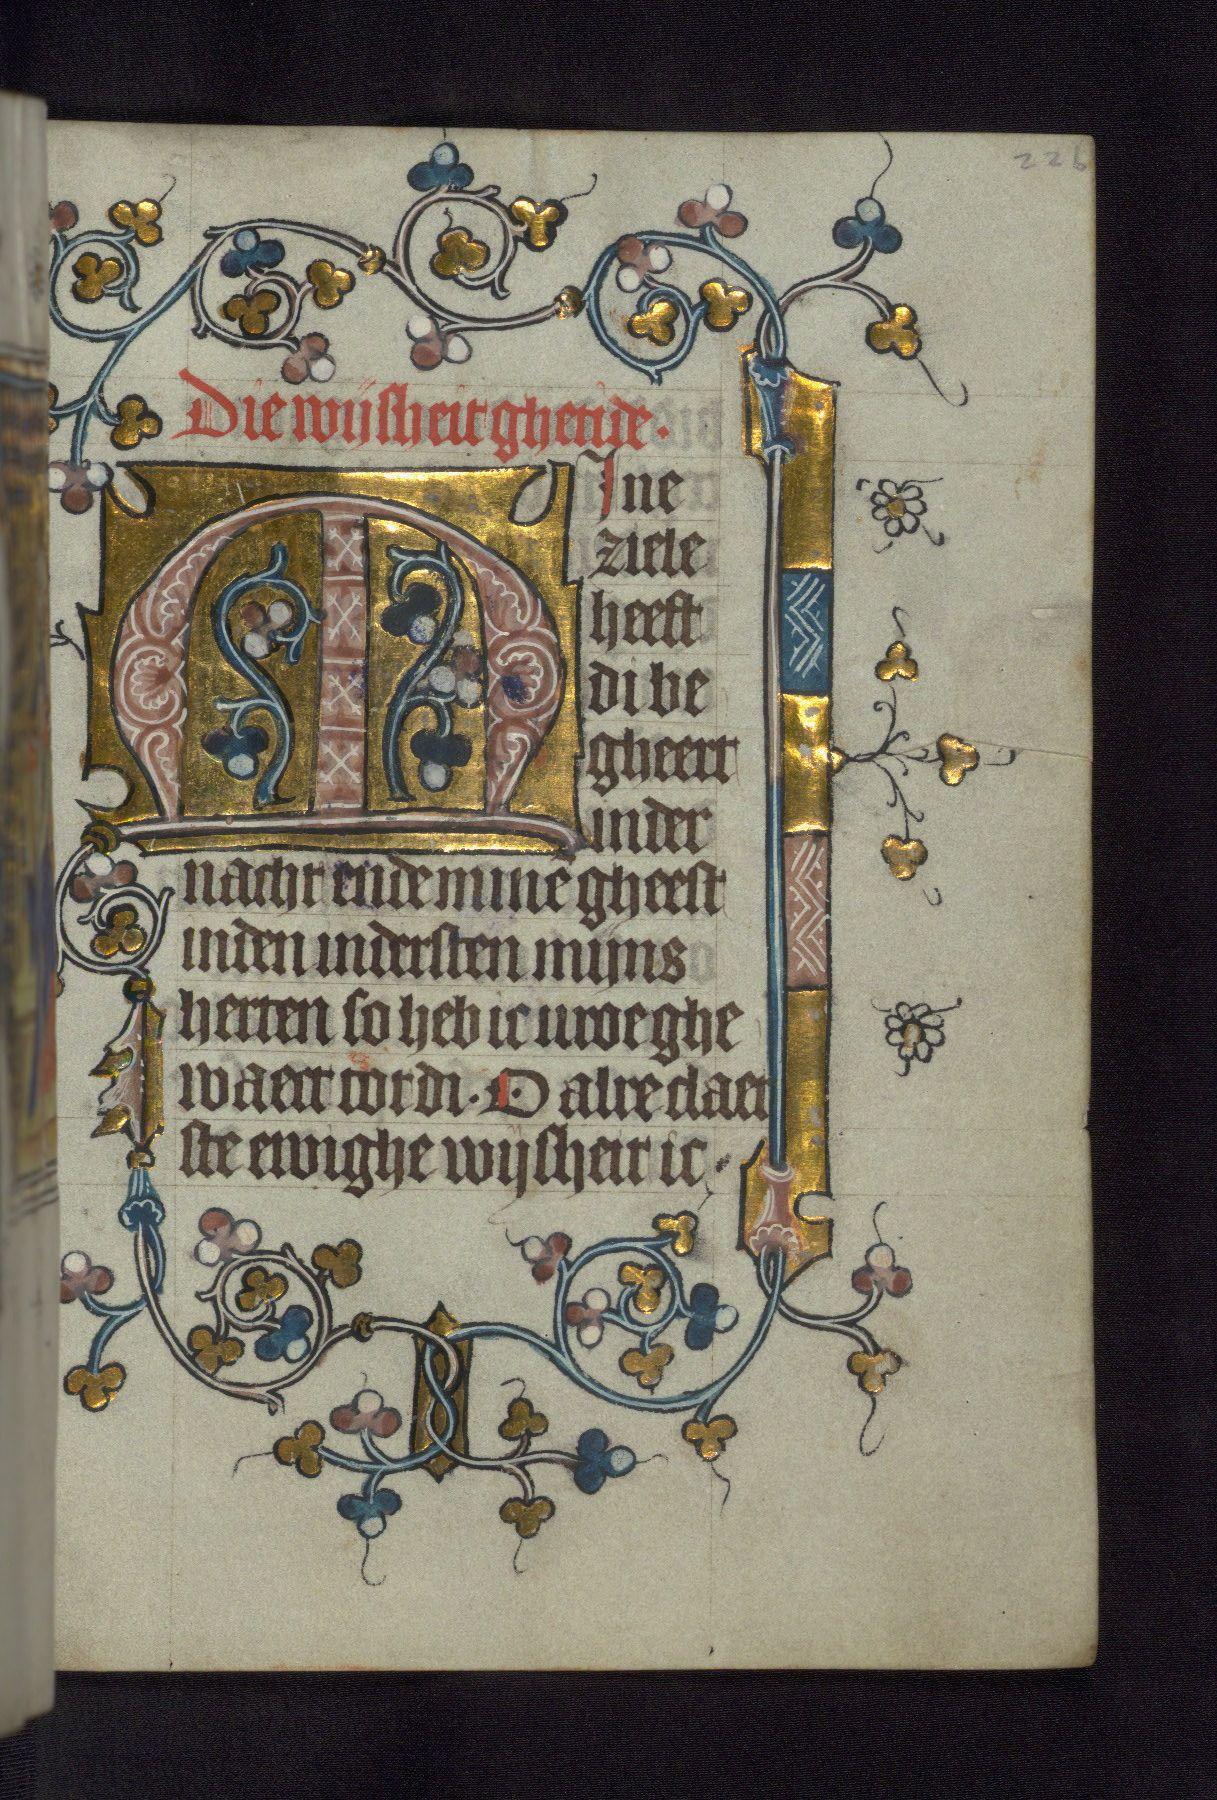 "Illuminated initial M from medieval manuscript ""Doffinnes ..."